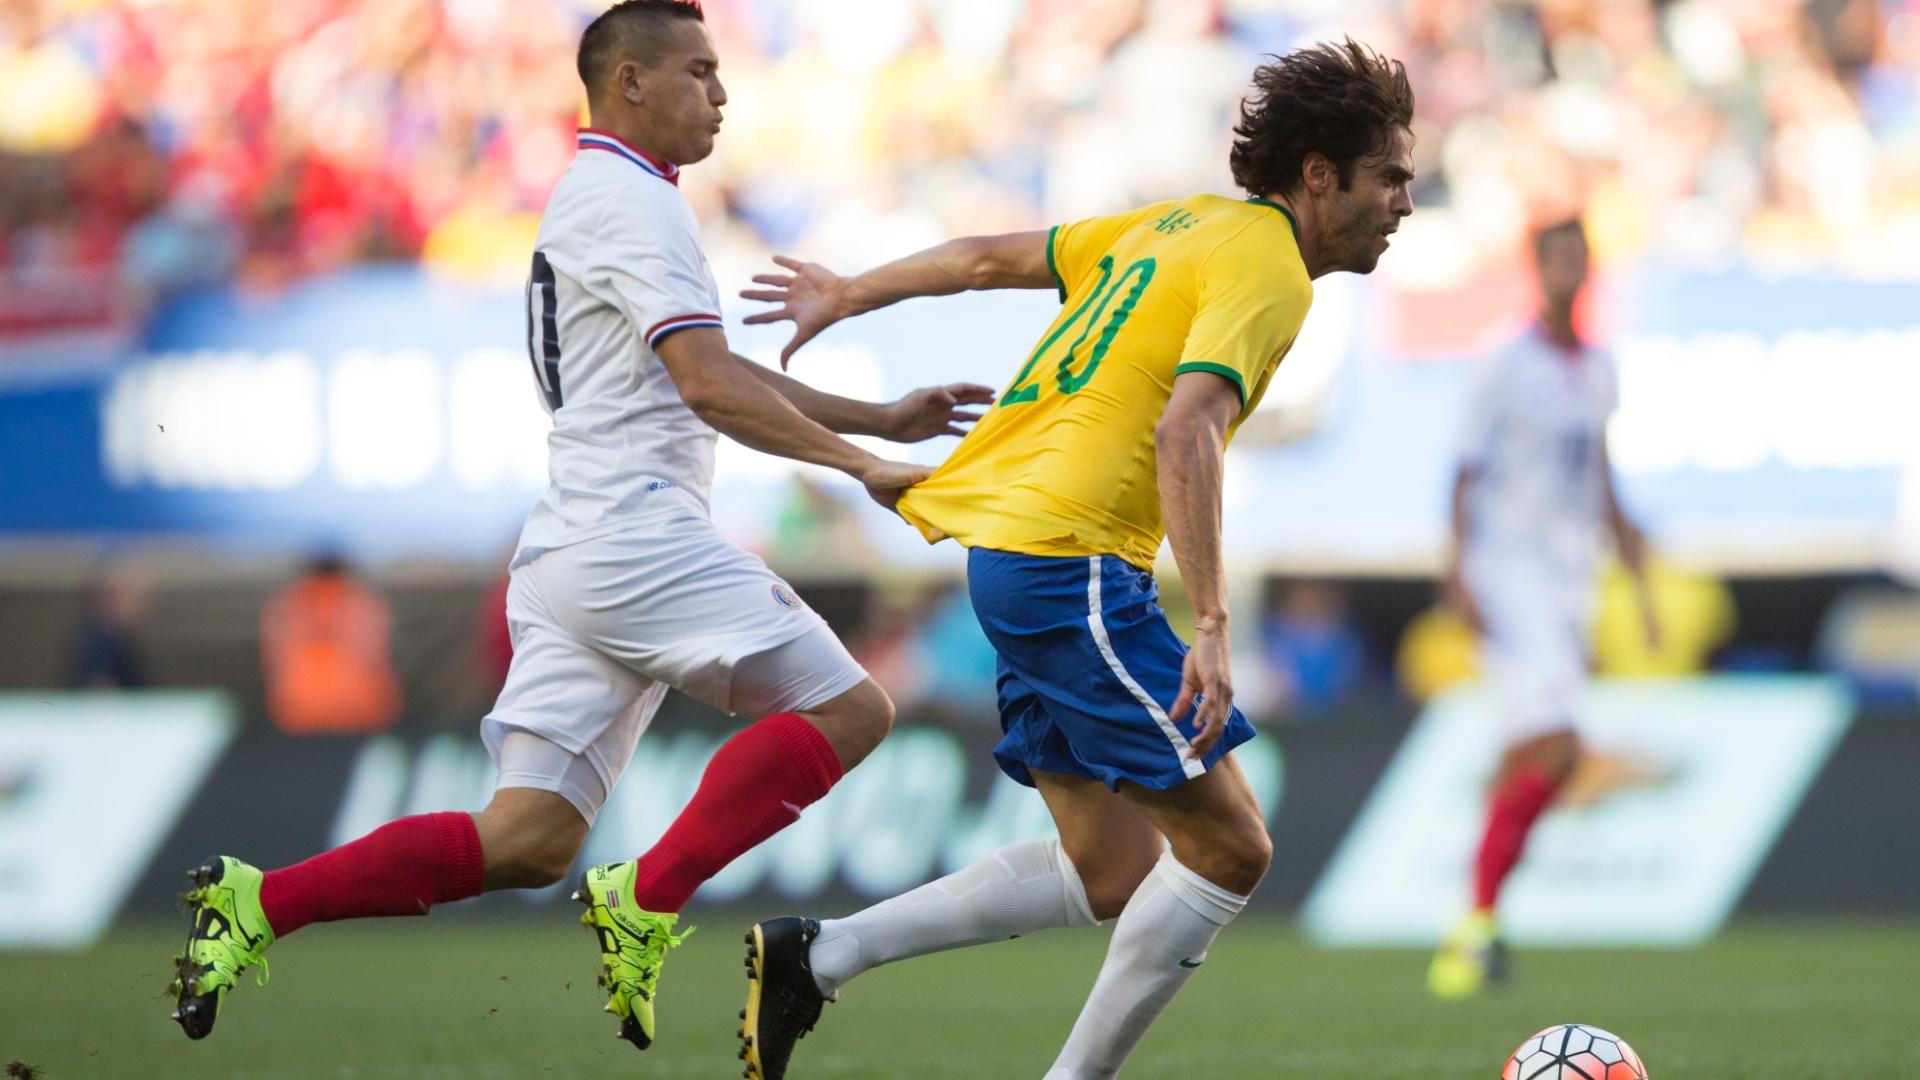 Kaká é marcado por jogadora da Costa Rica, durante amistoso neste sábado (5), realizado nos Estados Unidos